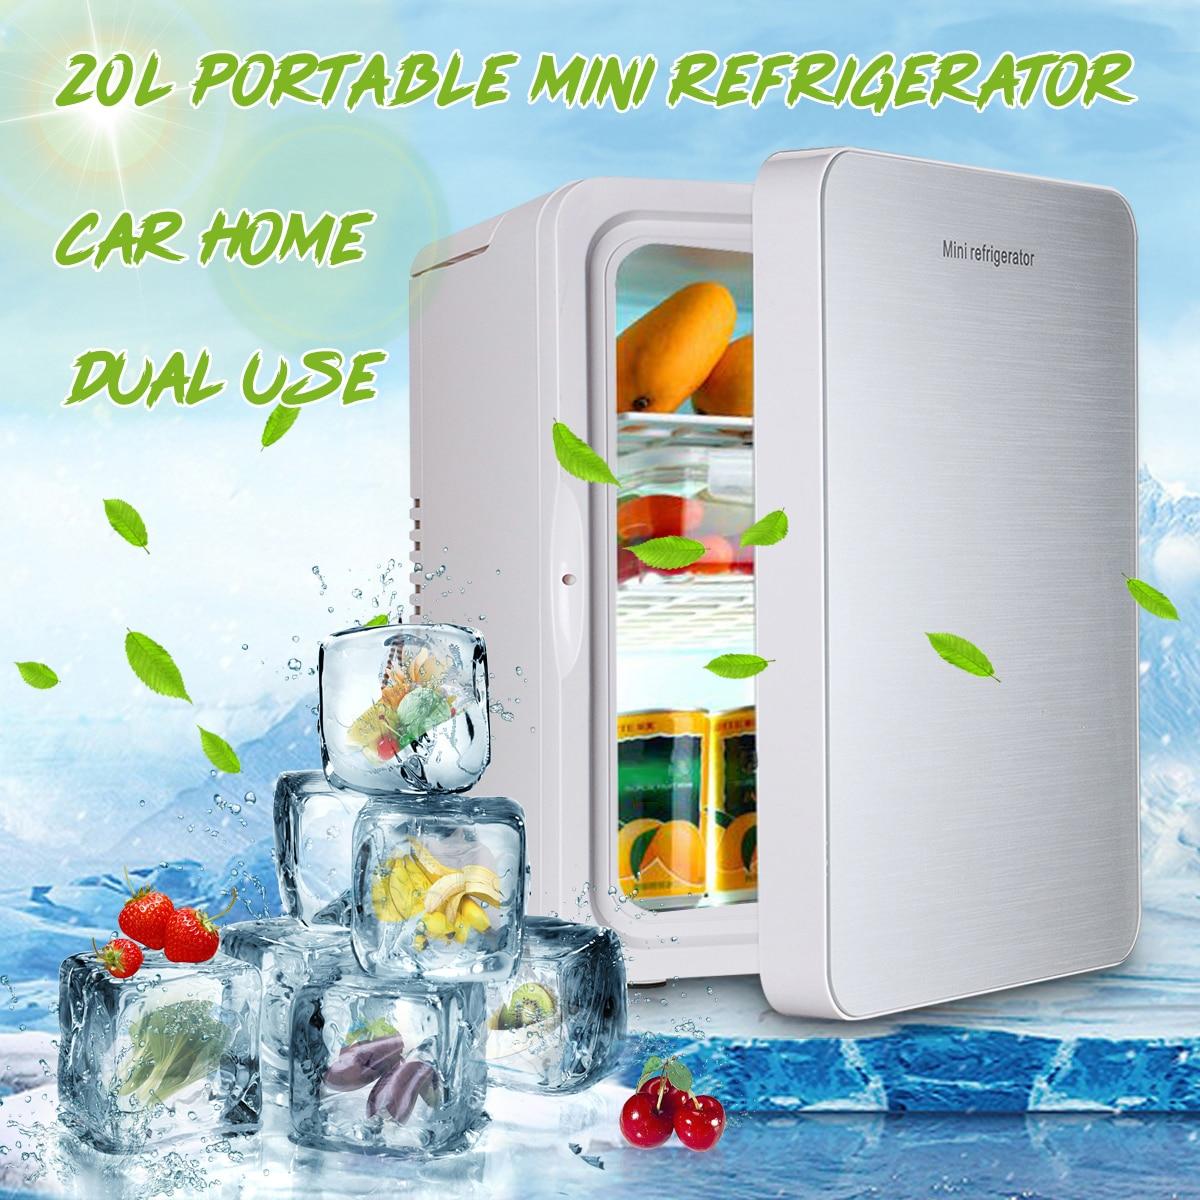 20L Portable Mini Refrigerator 12V/220V 56W Car Camping Home <font><b>Fridge</b></font> Cooler & Warmer Single Core Good Heat Dissipation Low Noise